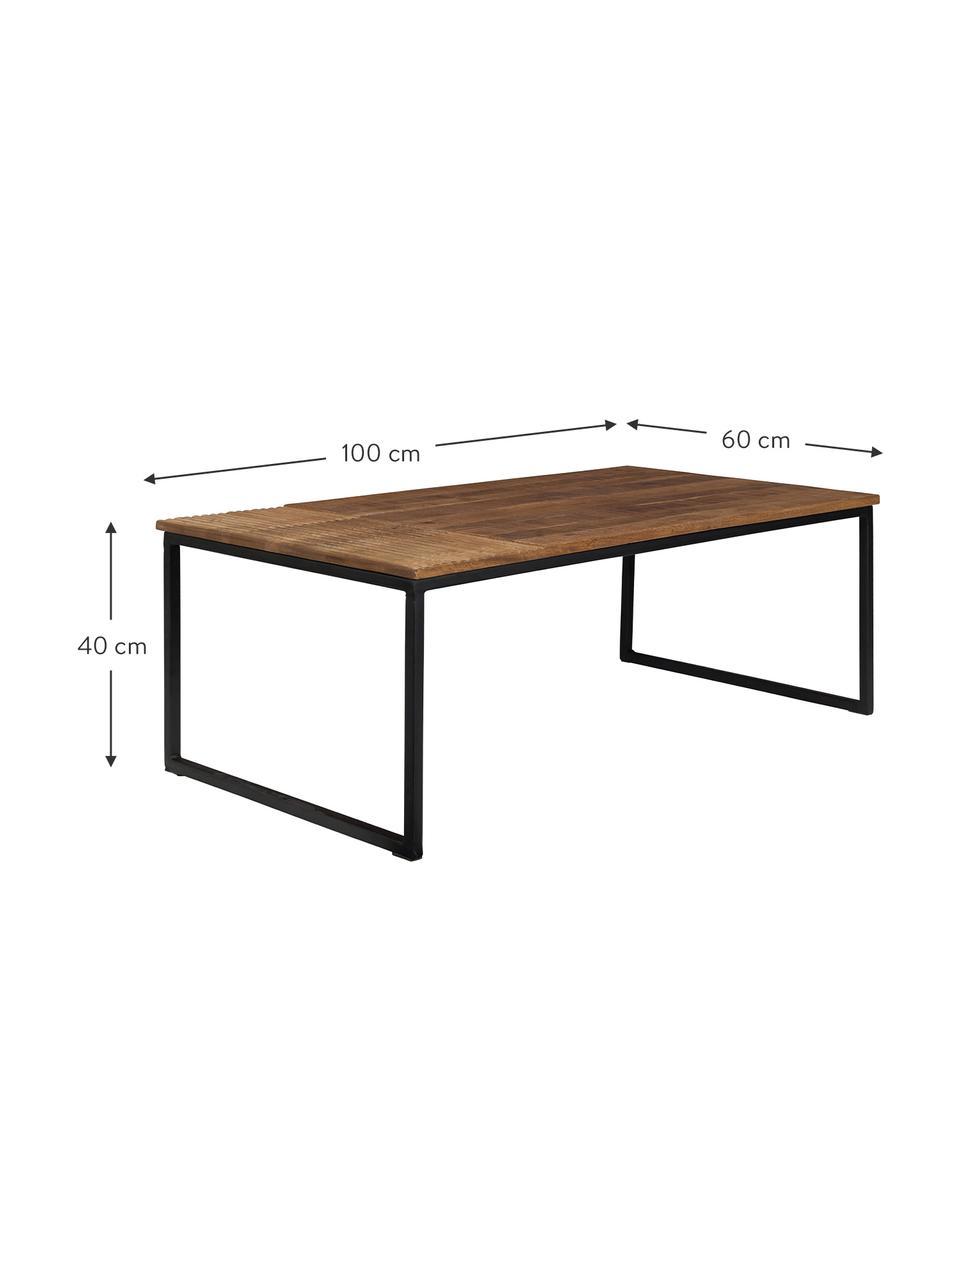 Massief houten salontafel Randi in industrieel design, Tafelblad: mangohout, massief, Frame: gepoedercoat ijzer, Tafelblad: mangohoutkleurig. Poten: zwart, 110 x 40 cm